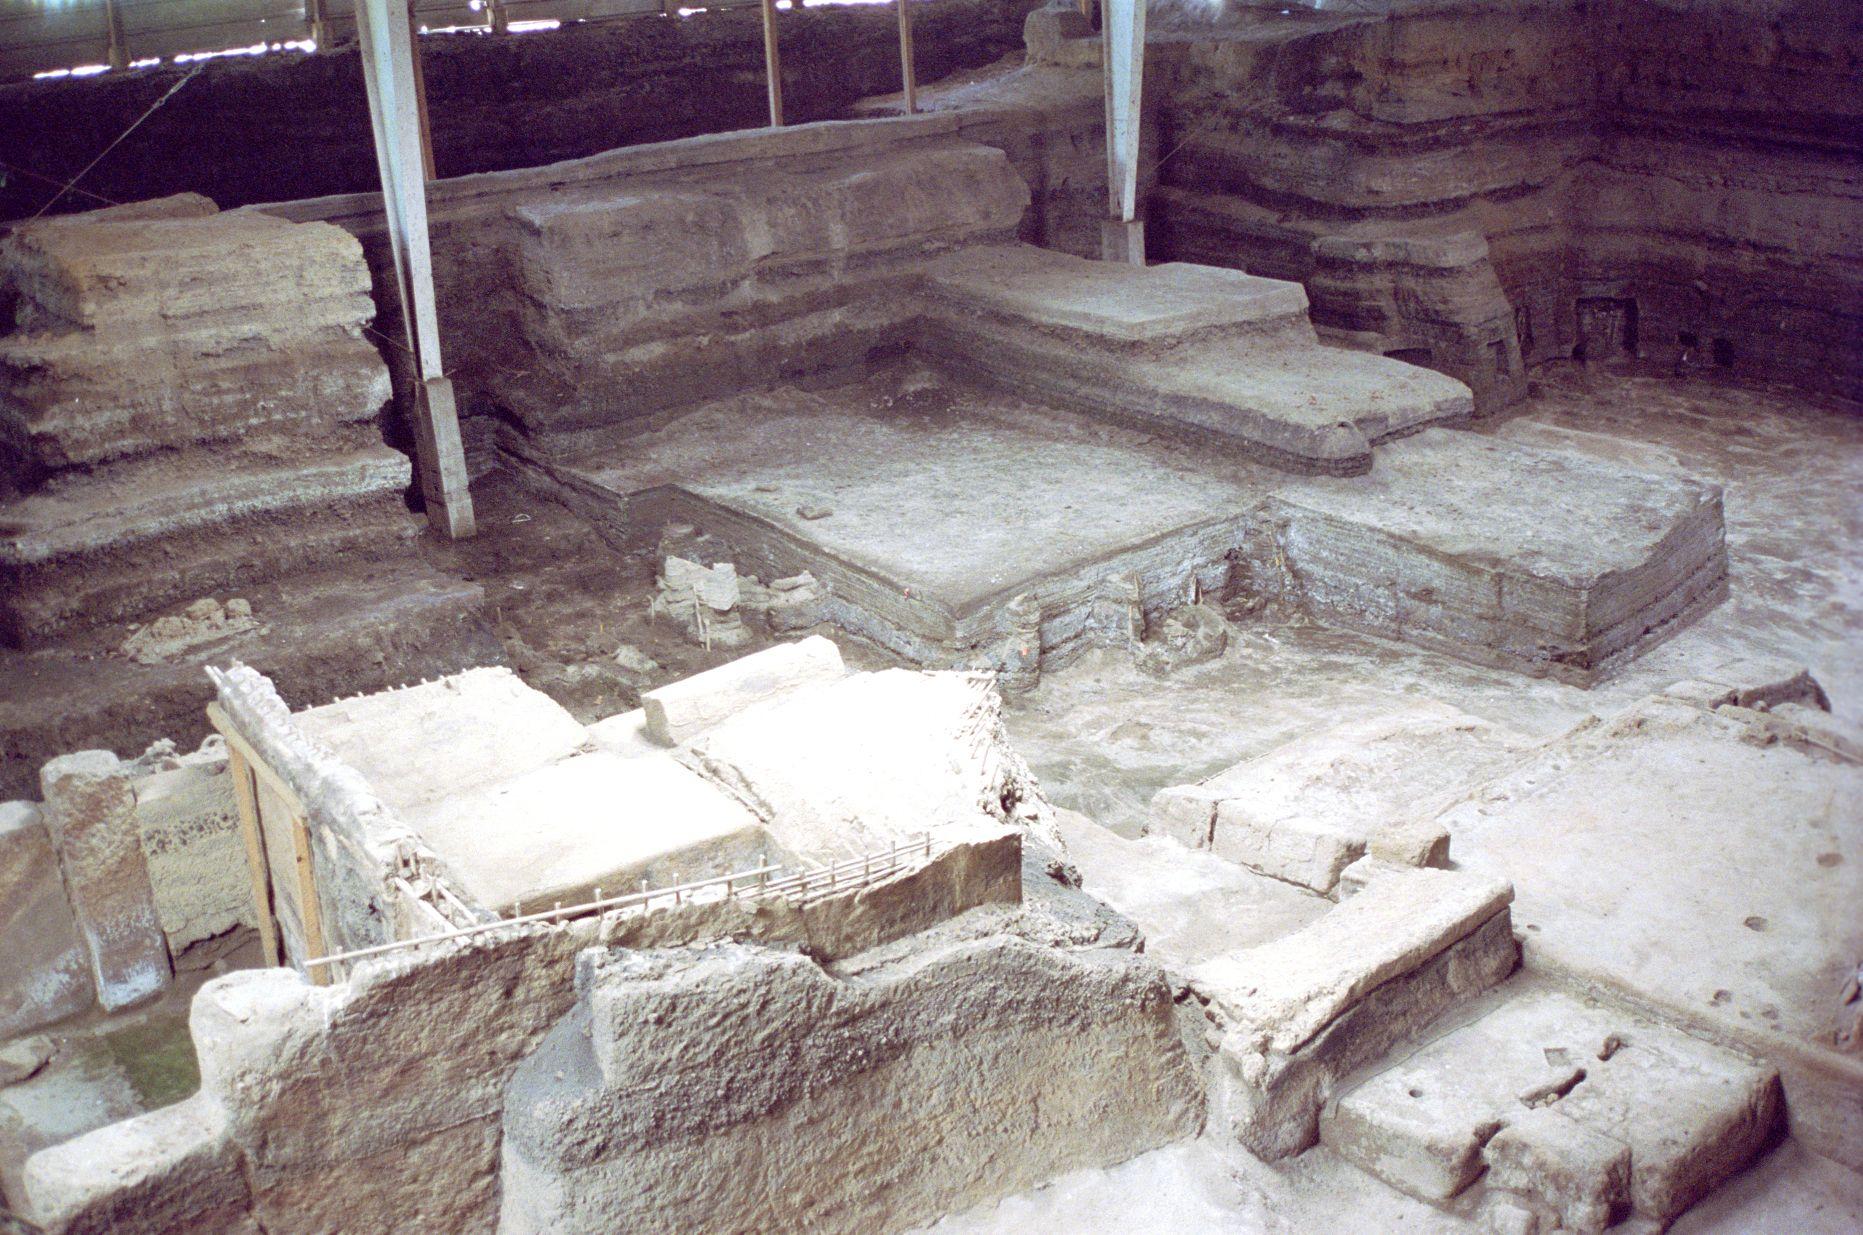 Joya de Cerén, El Salvador. Maya Archaeology